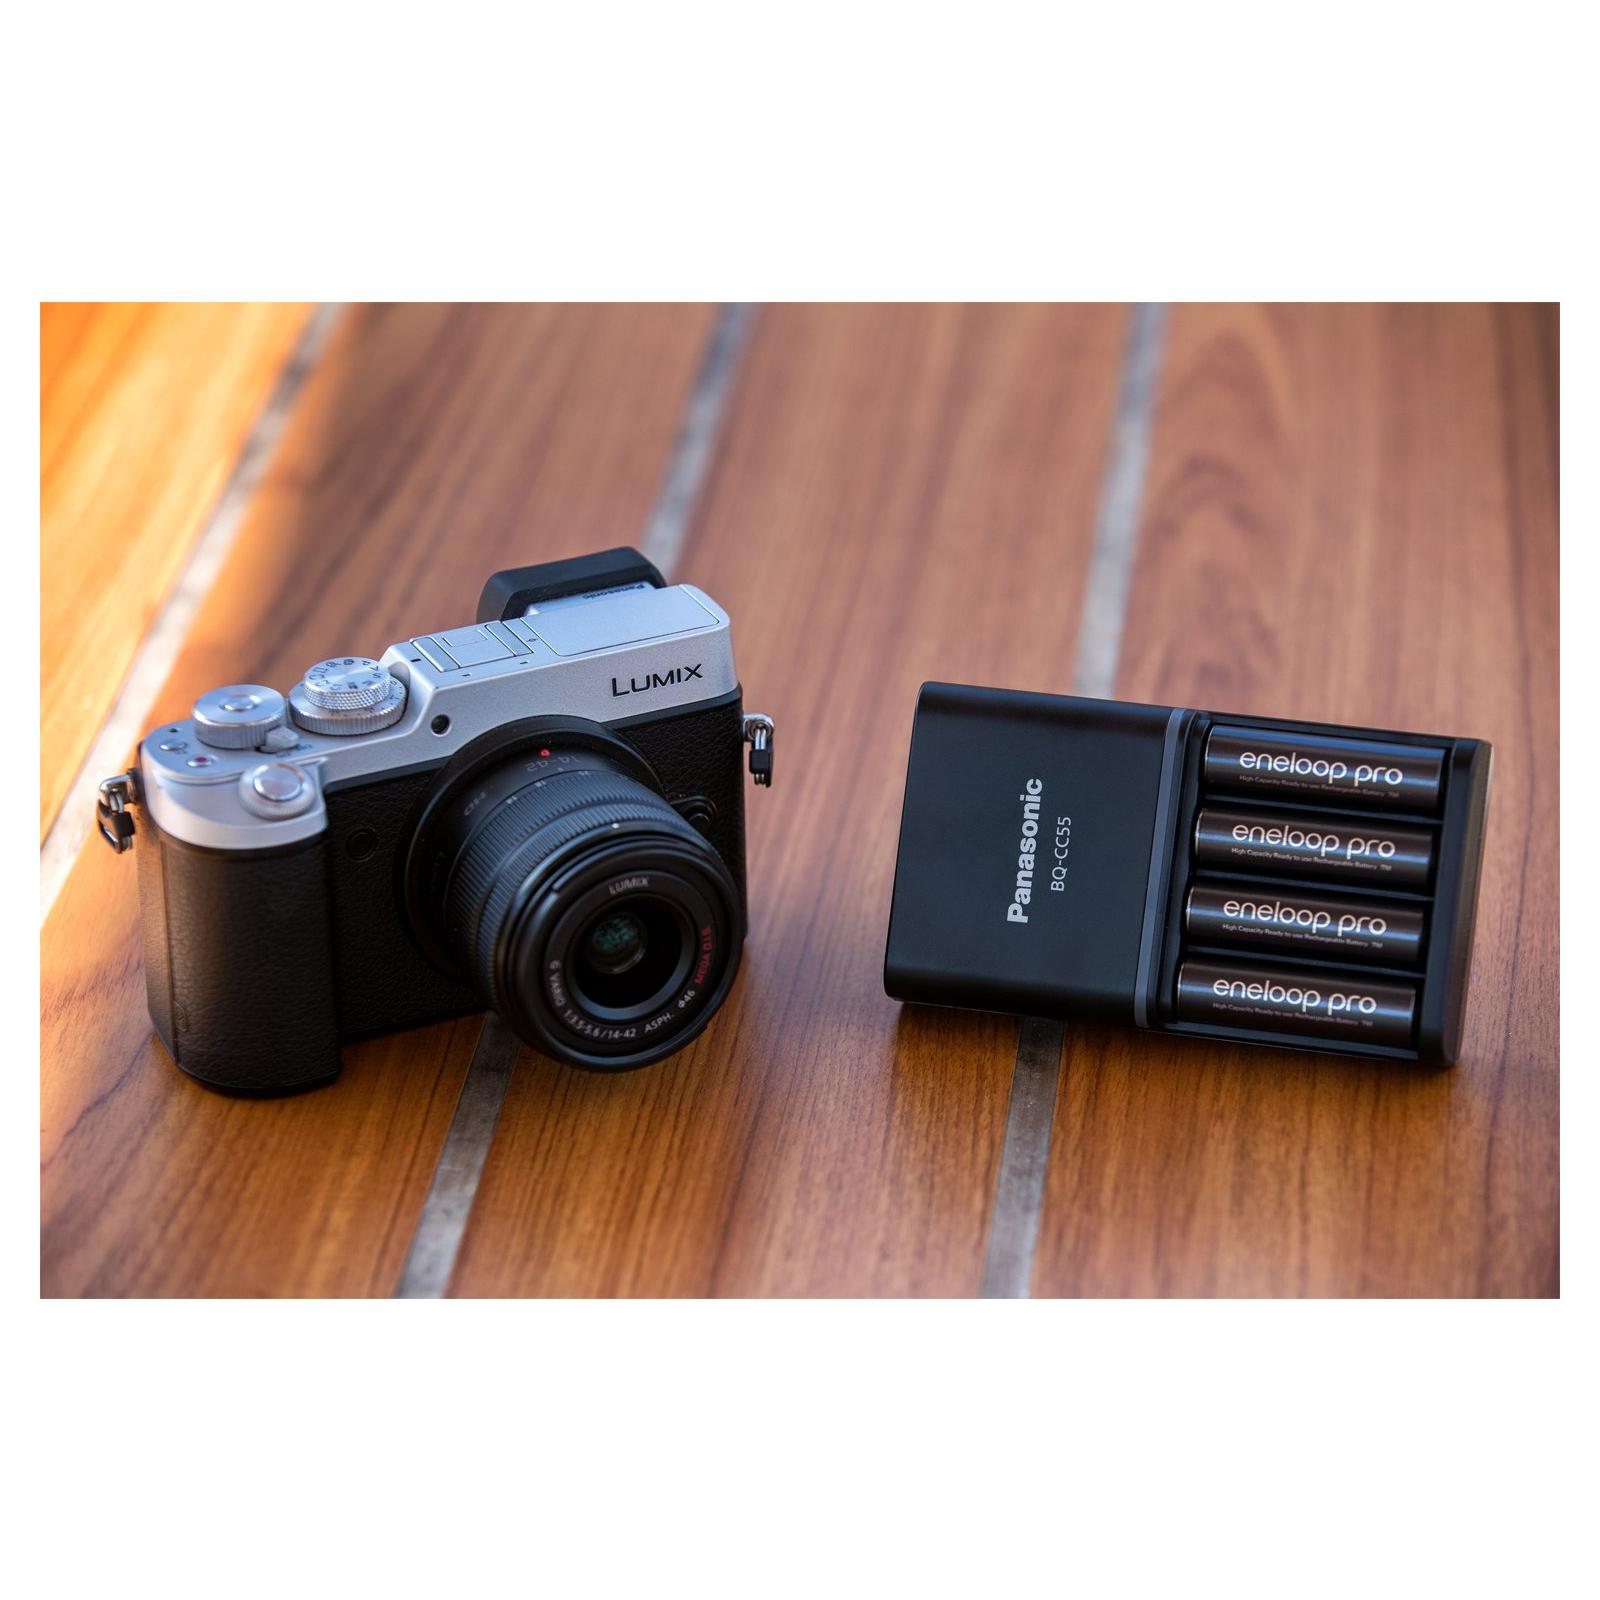 Зарядное устройство для аккумуляторов PANASONIC Smart-Quick Charger+Eneloop Pro +4*AA 2500 mAh NI-MH (K-KJ55HCD40E) изображение 2